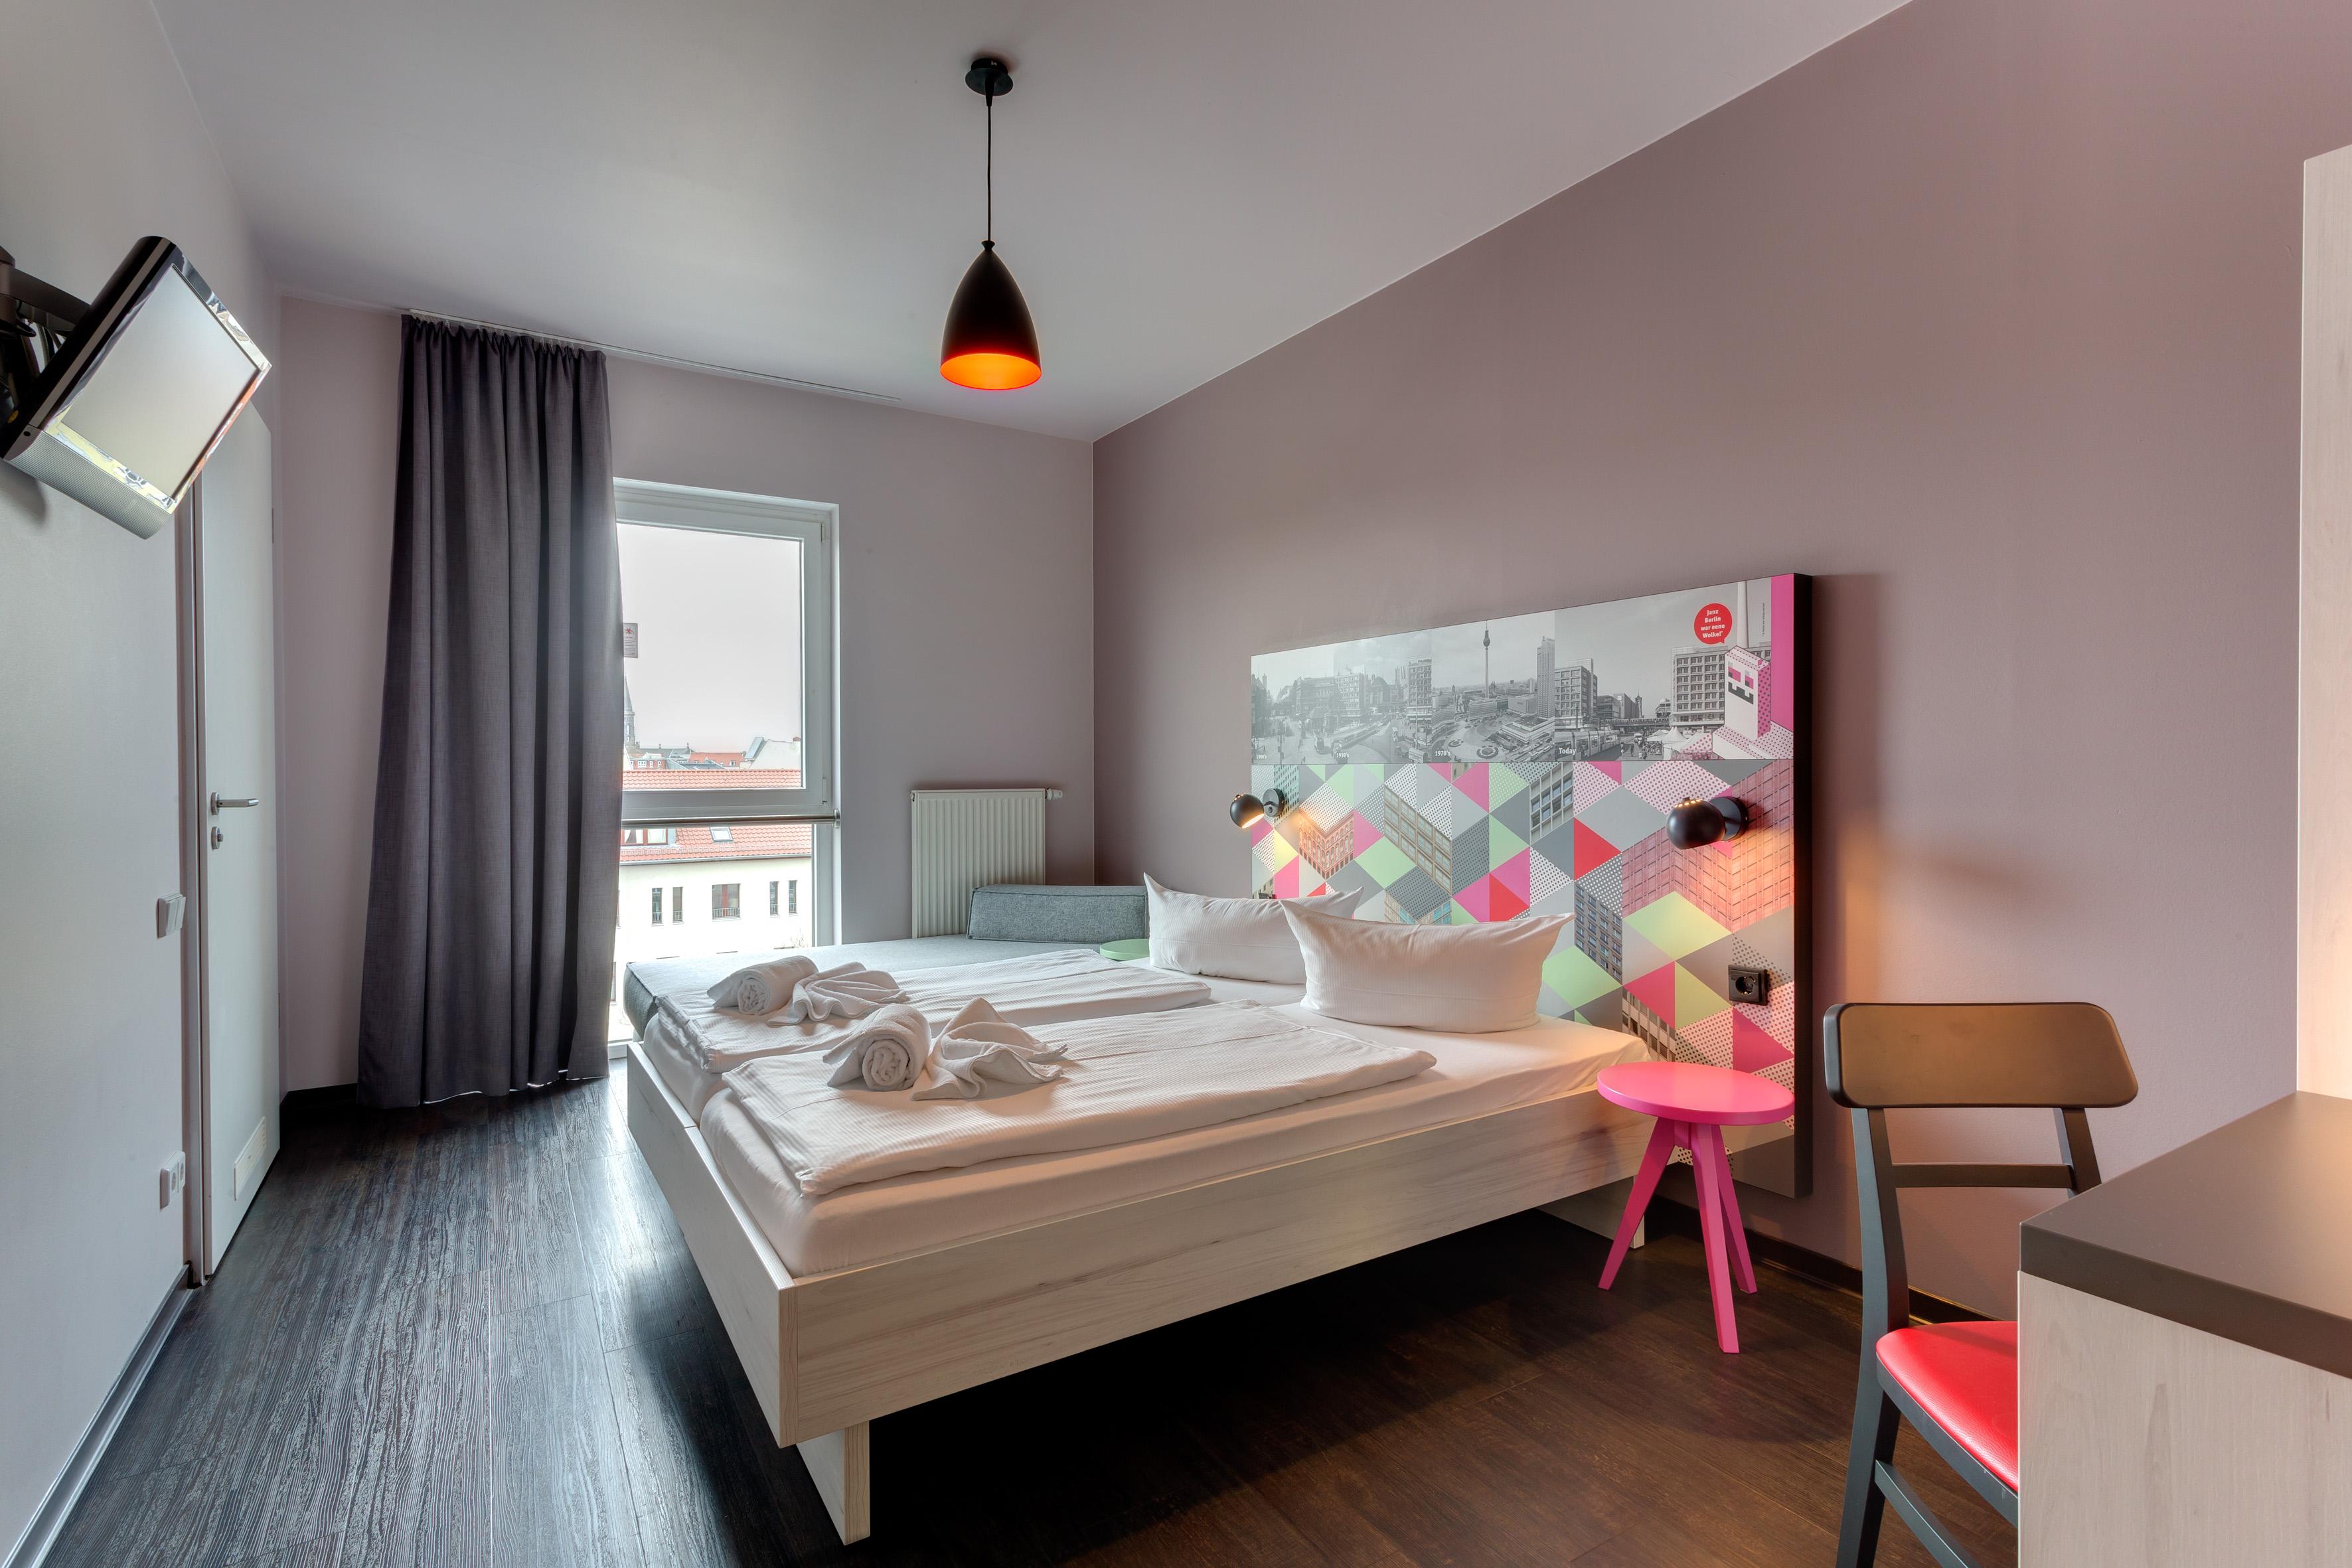 MEININGER Hotel Berlin Alexanderplatz - Chambre Simple / Double